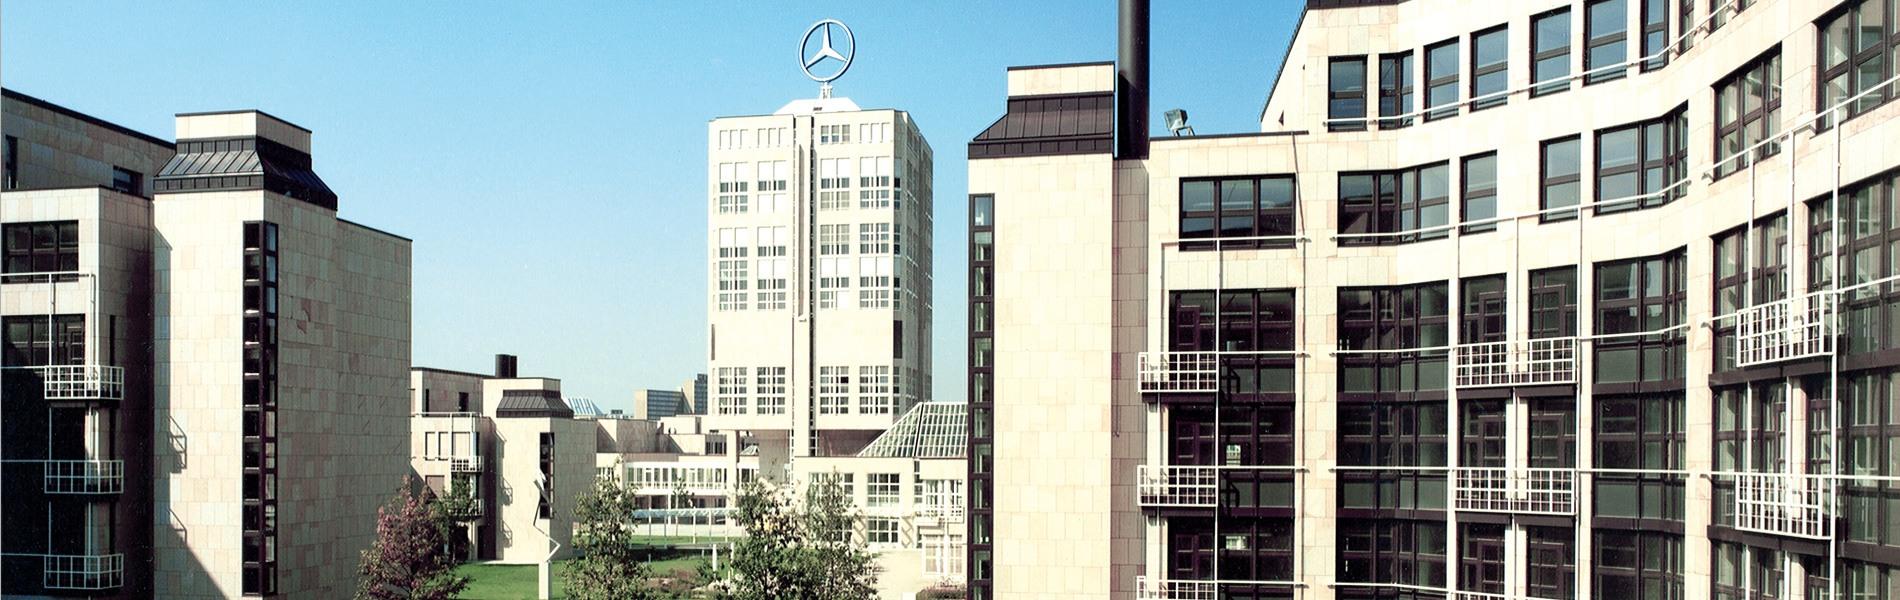 Fenster Und Türen Stuttgart neuffer fenster türen gmbh fensterhersteller seit 1872 neuffer de